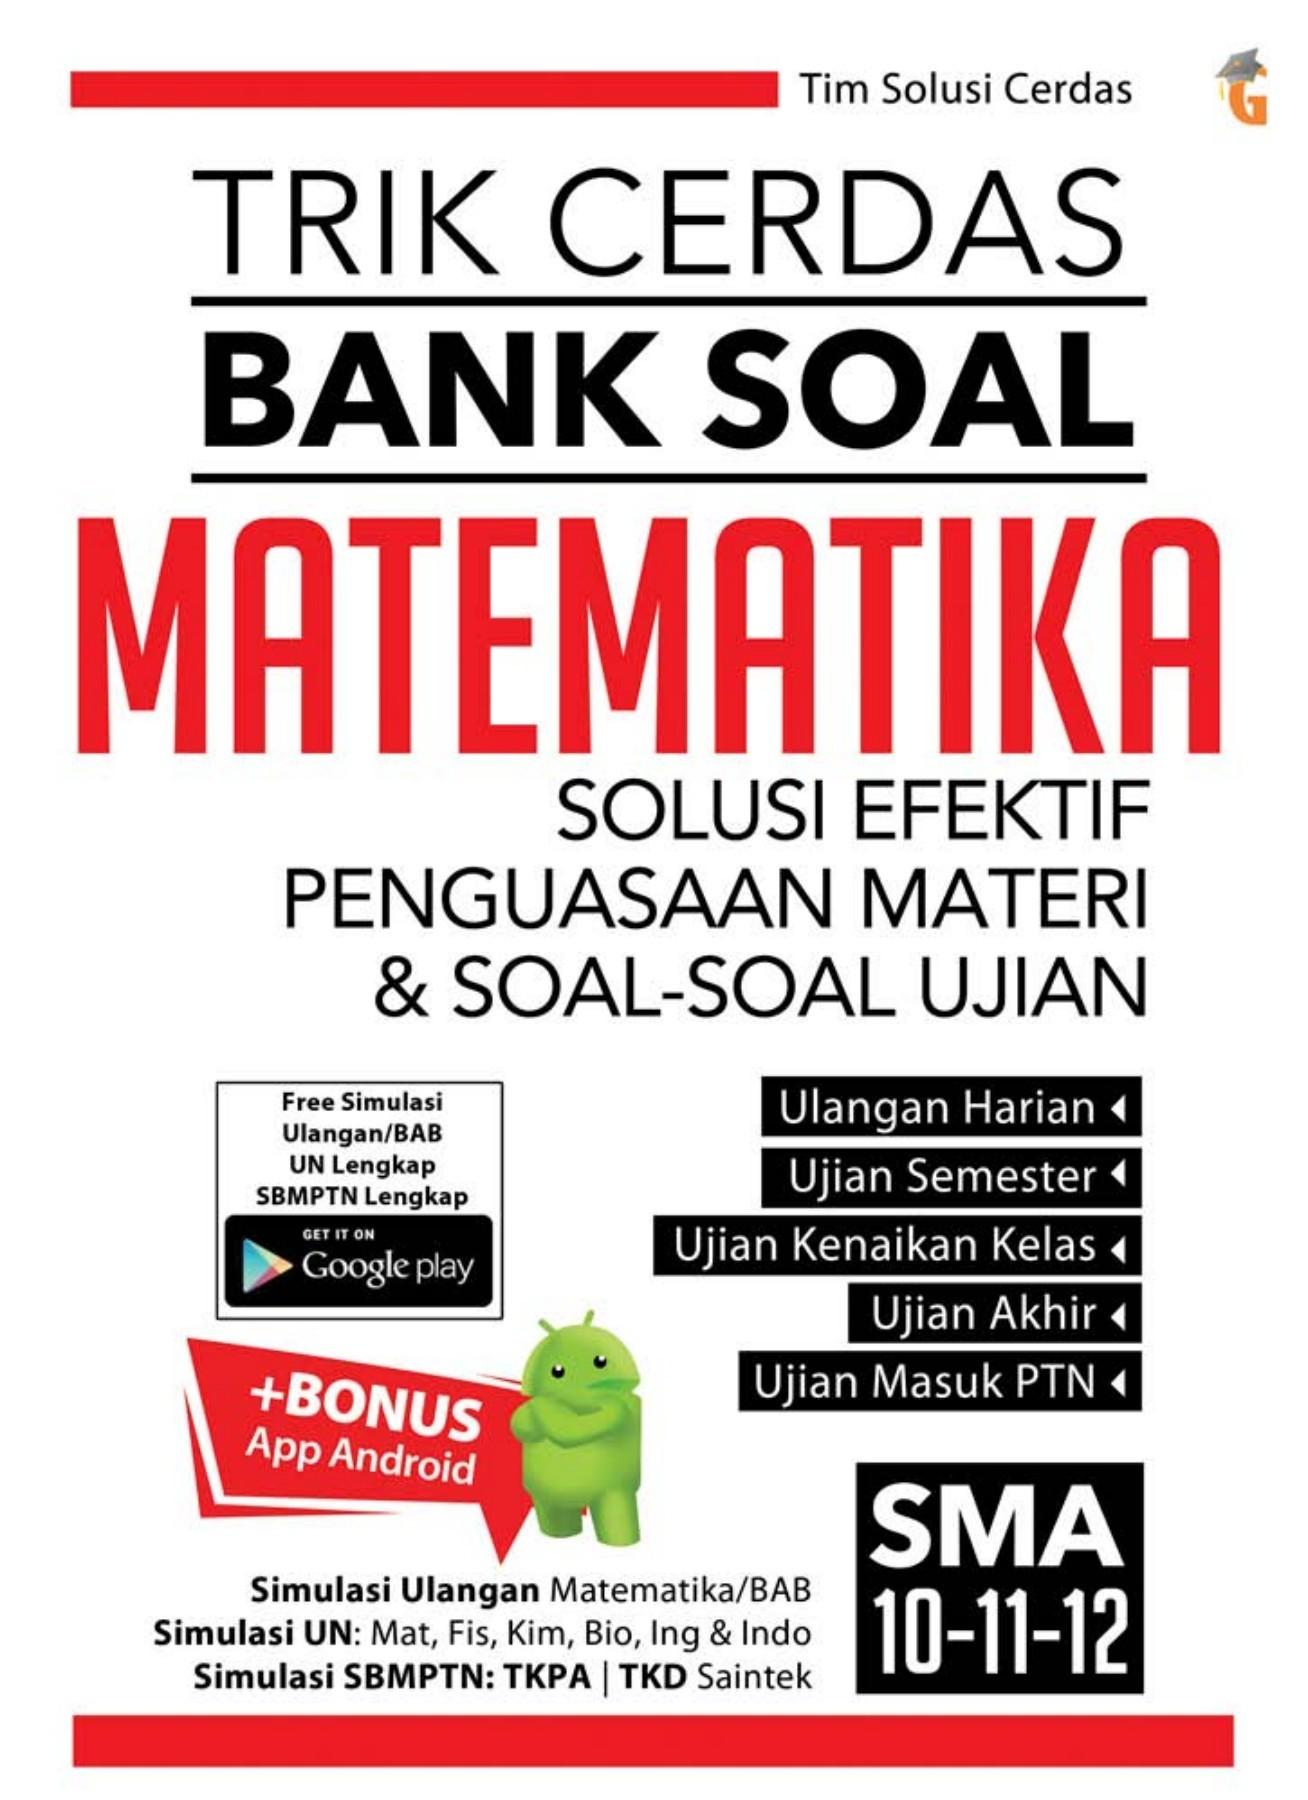 Bank Soal Matematika Sma : matematika, Cerdas, Matematika